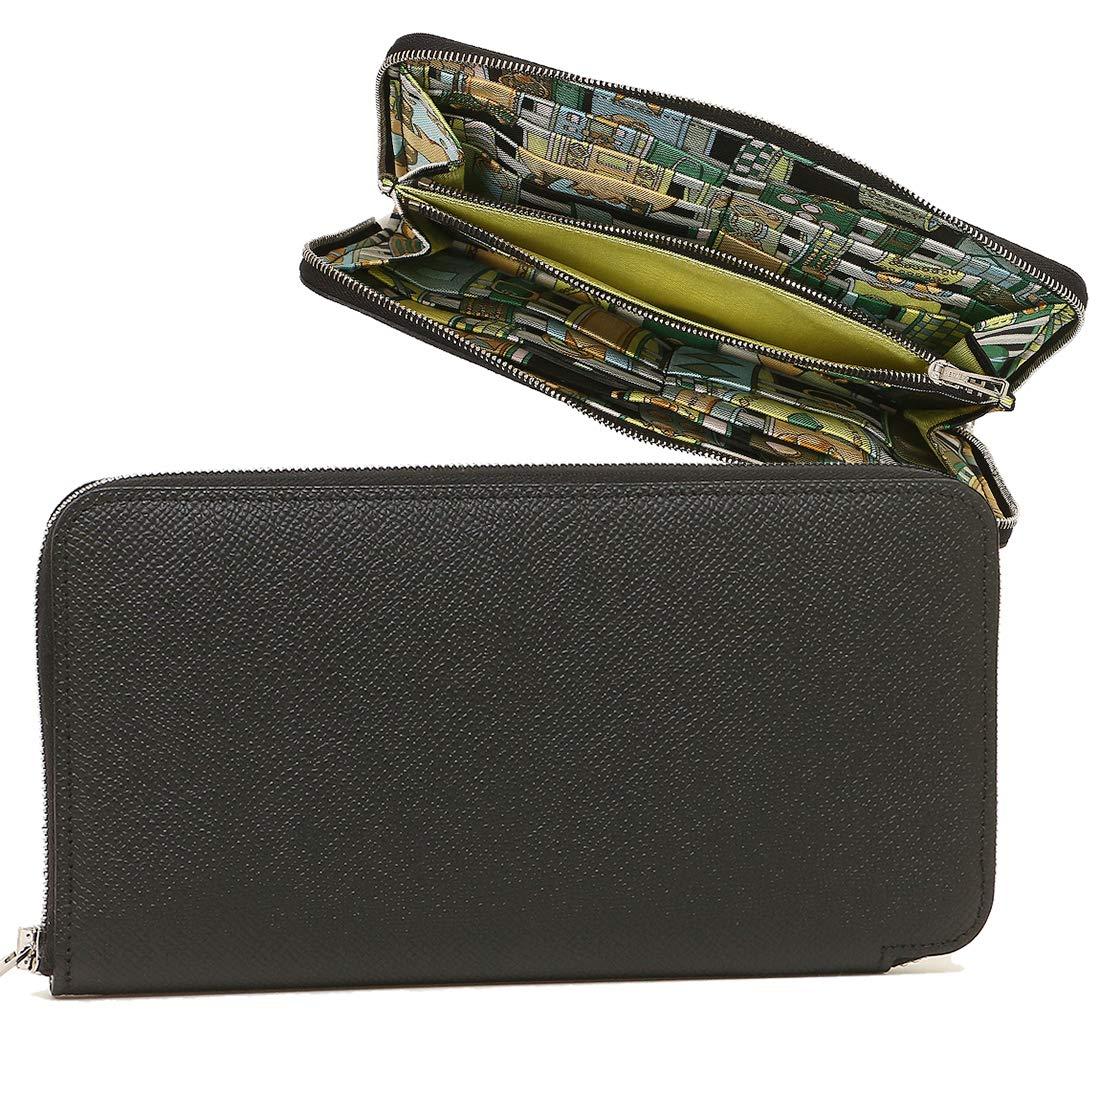 1007d9a5536f Amazon | [エルメス]長財布 レディース HERMES H067388 AH ブラック マルチカラー [並行輸入品] |  HERMES(エルメス) | 財布